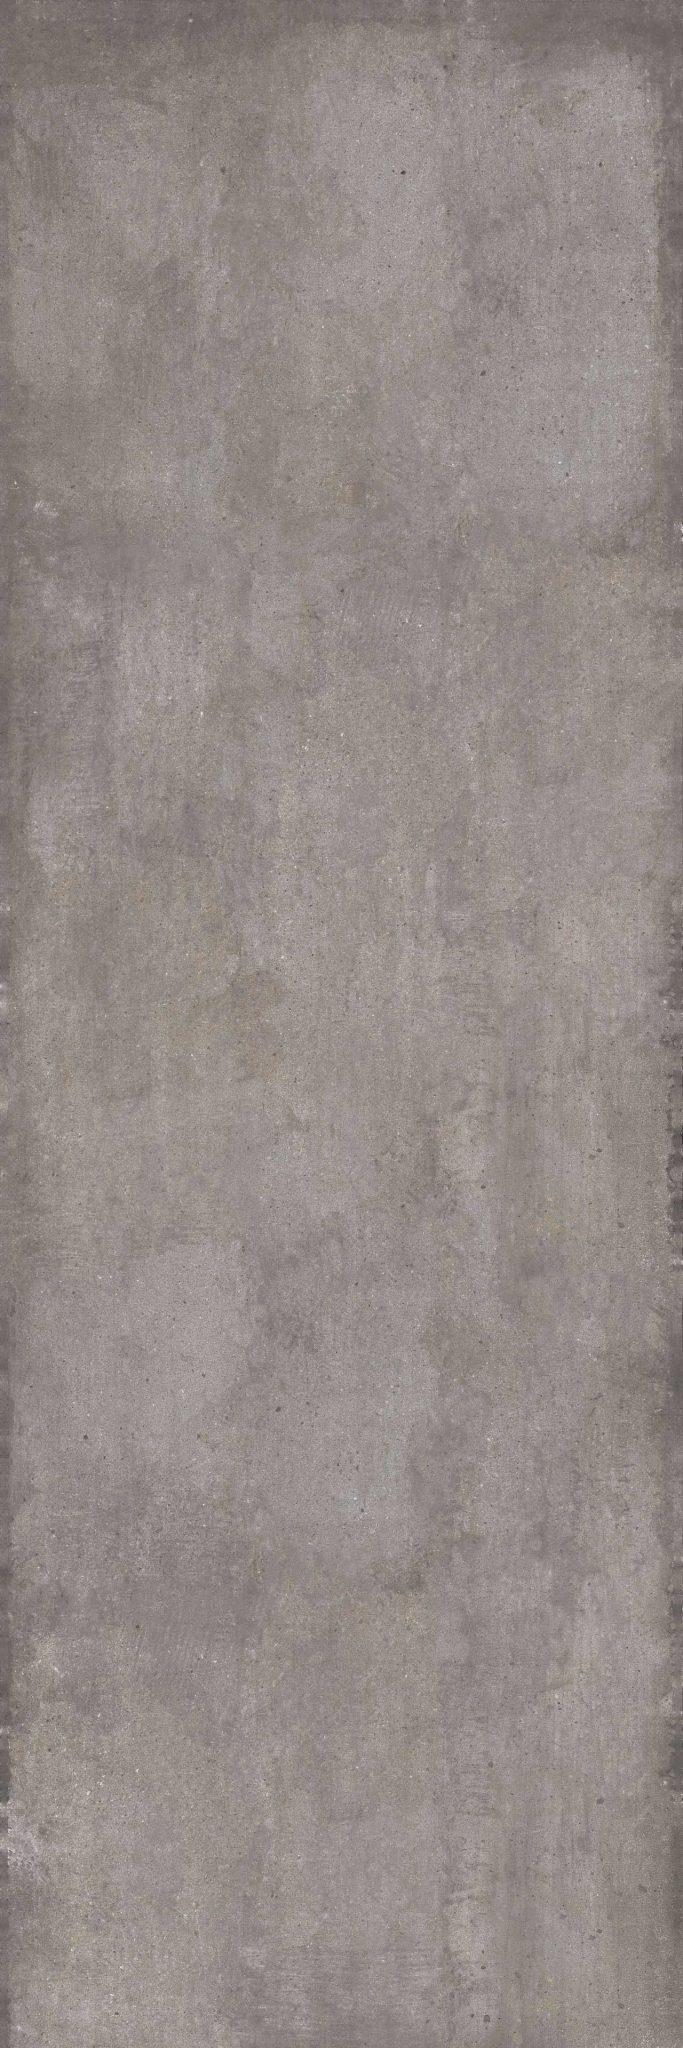 Citystone grey